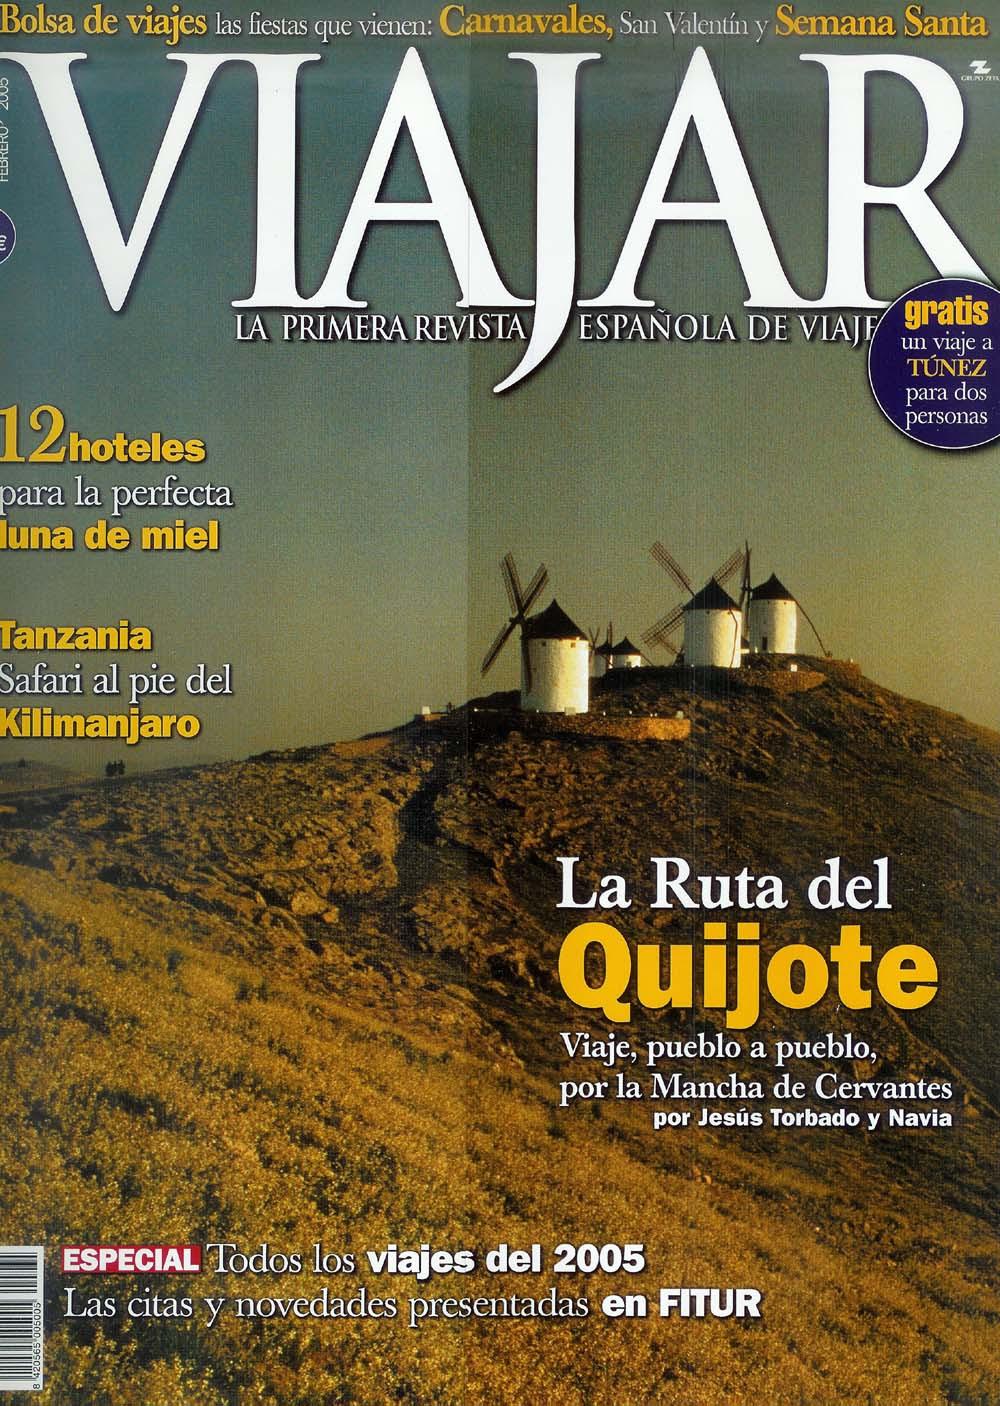 Primer Y Segundo Viajes De Don Quijote De La Mancha Eosgis Cartografia Magazine